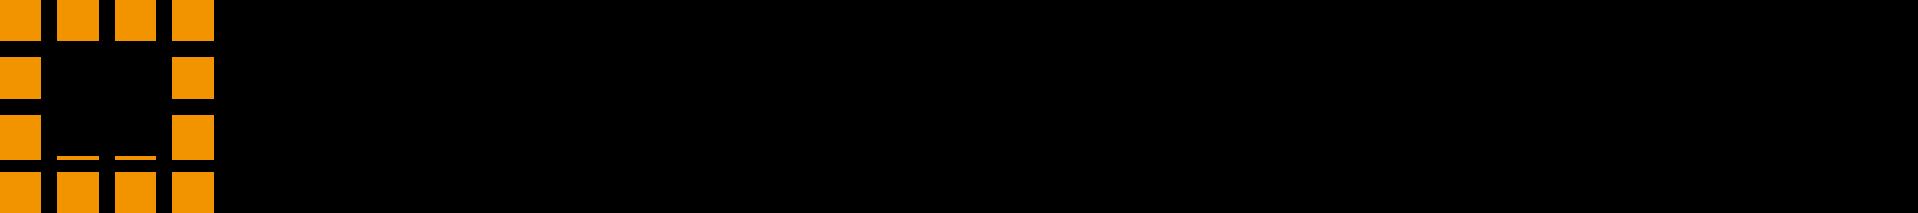 PRIATHERM